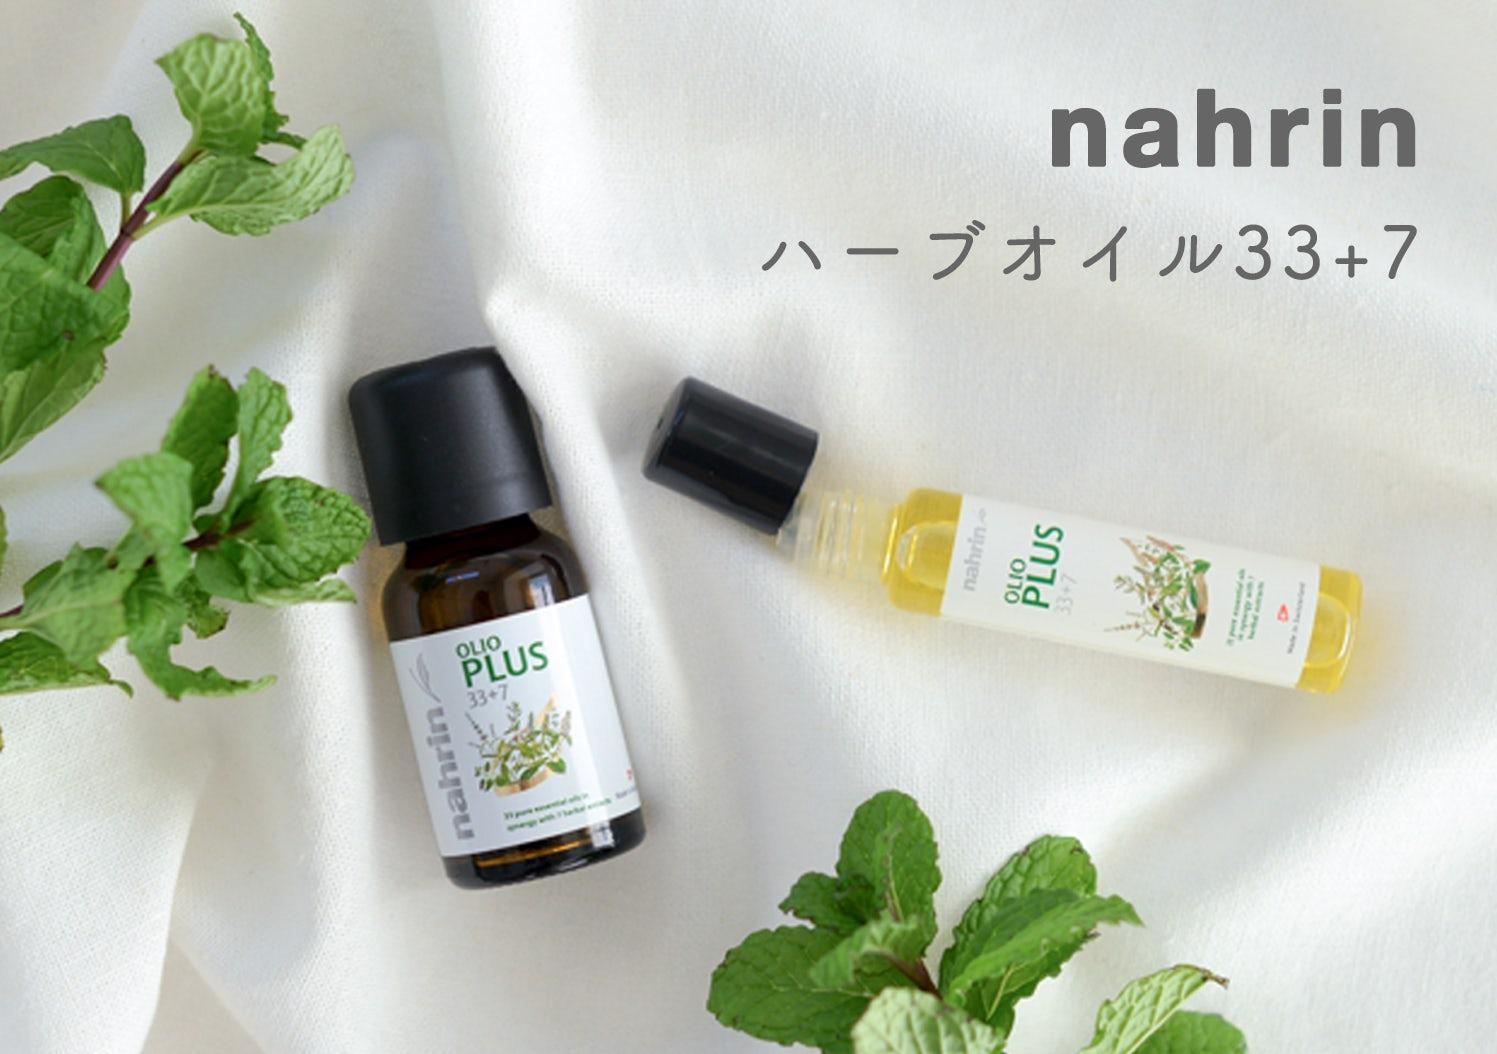 nahrin / ナリン / ハーブオイル 33+7の画像